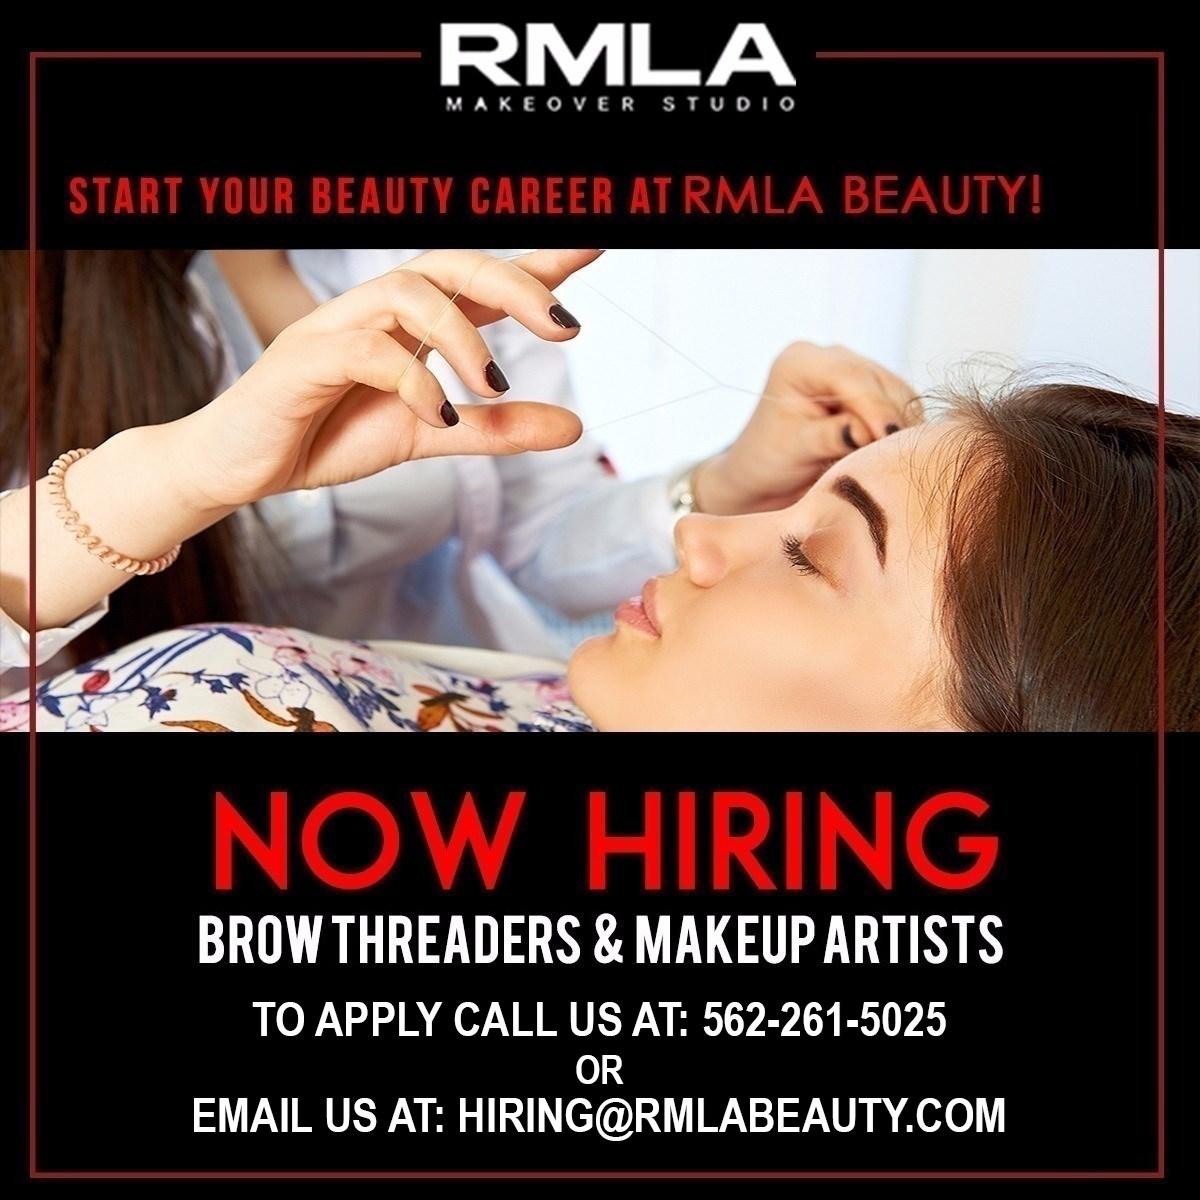 Eyebrow Threader Specialist Job In Beachwood Oh By Rmla Beauty 1